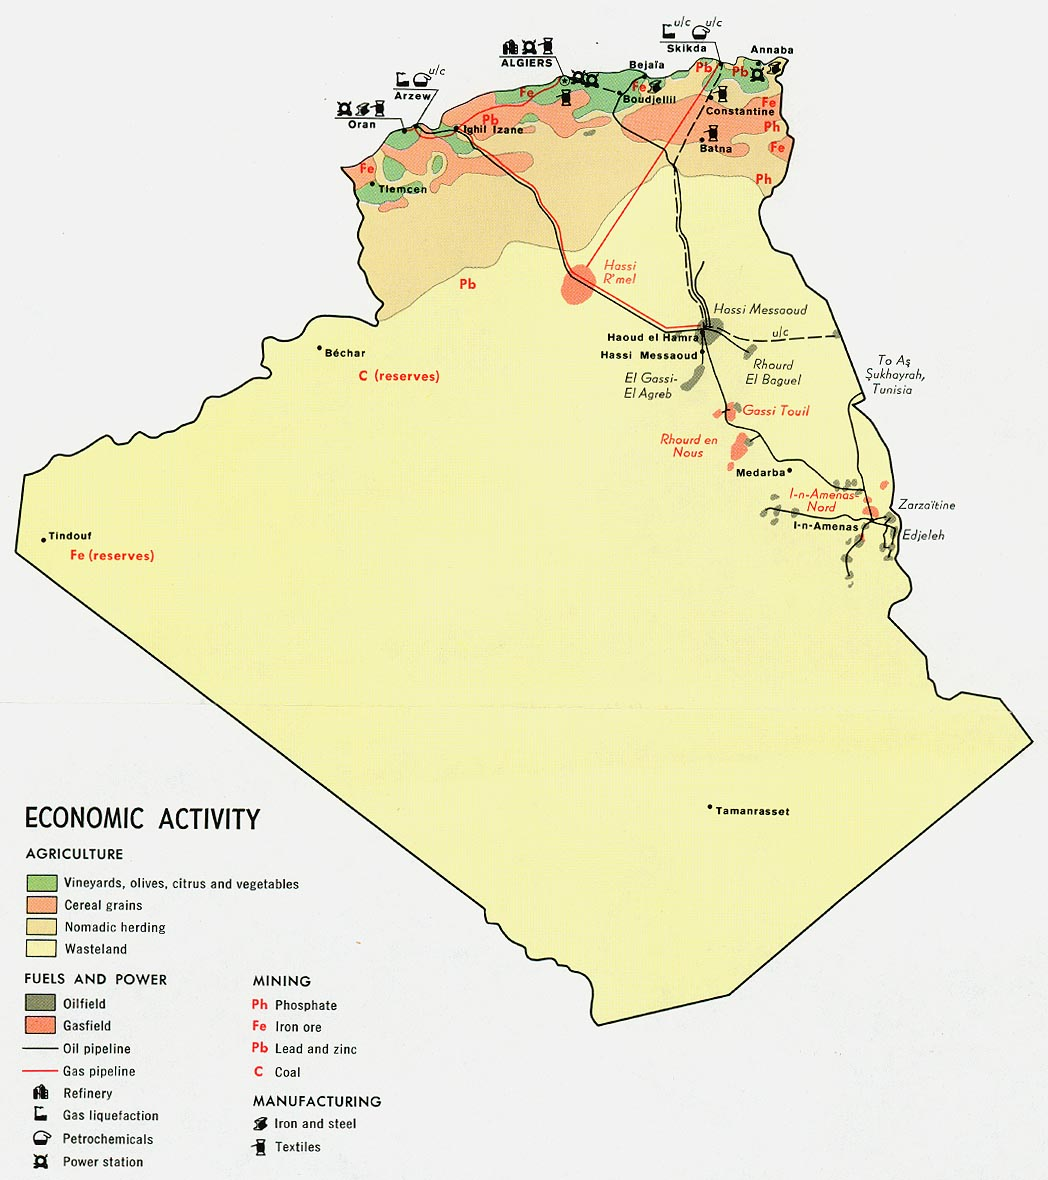 Free Download Algeria Maps - Algeria map